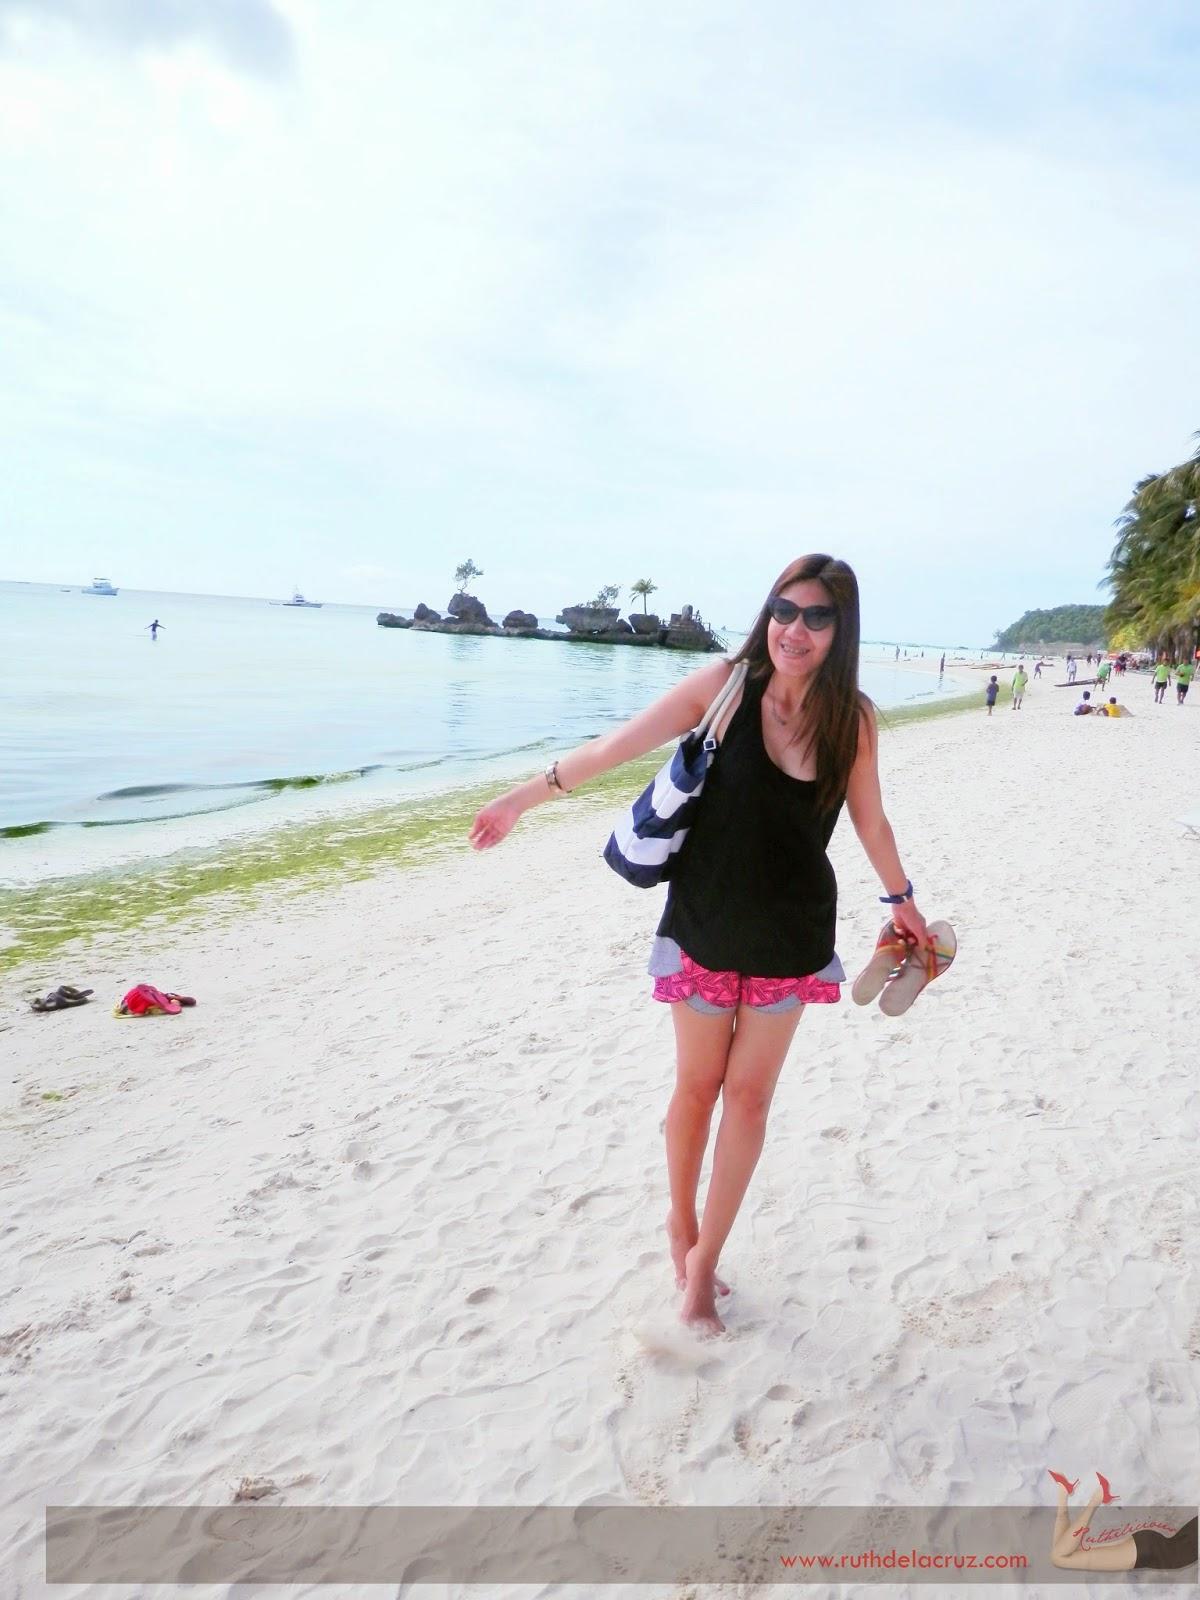 Ruthdelacruz | Travel And Lifestyle Blog  WIWTD + Ruth Goes Back To Boracay